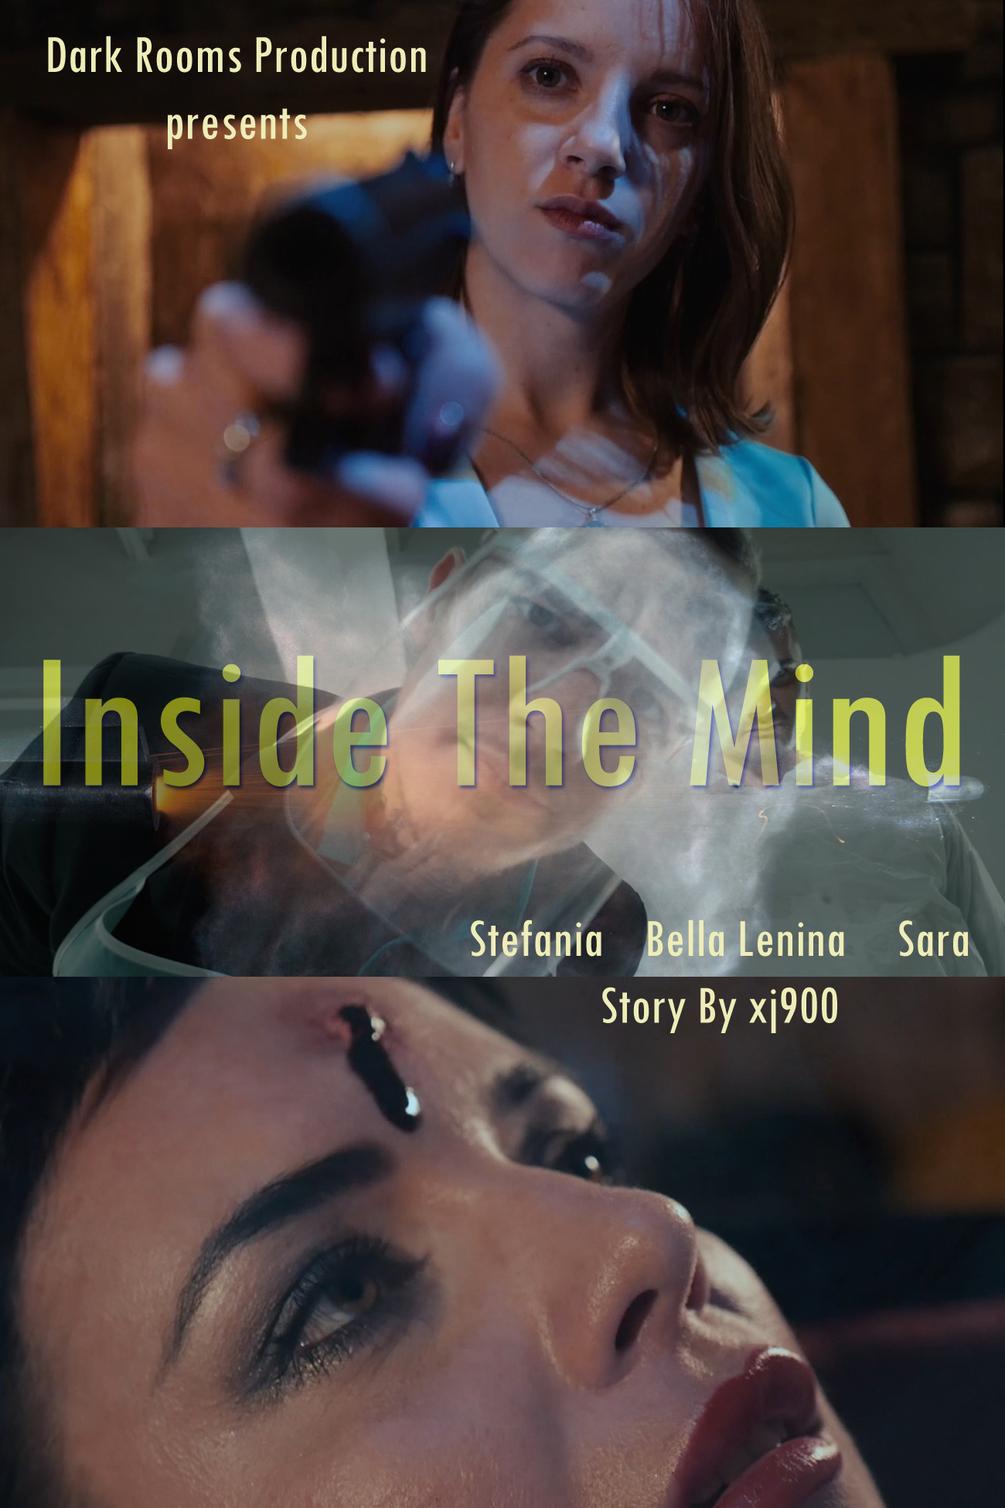 INSIDE THE MIND